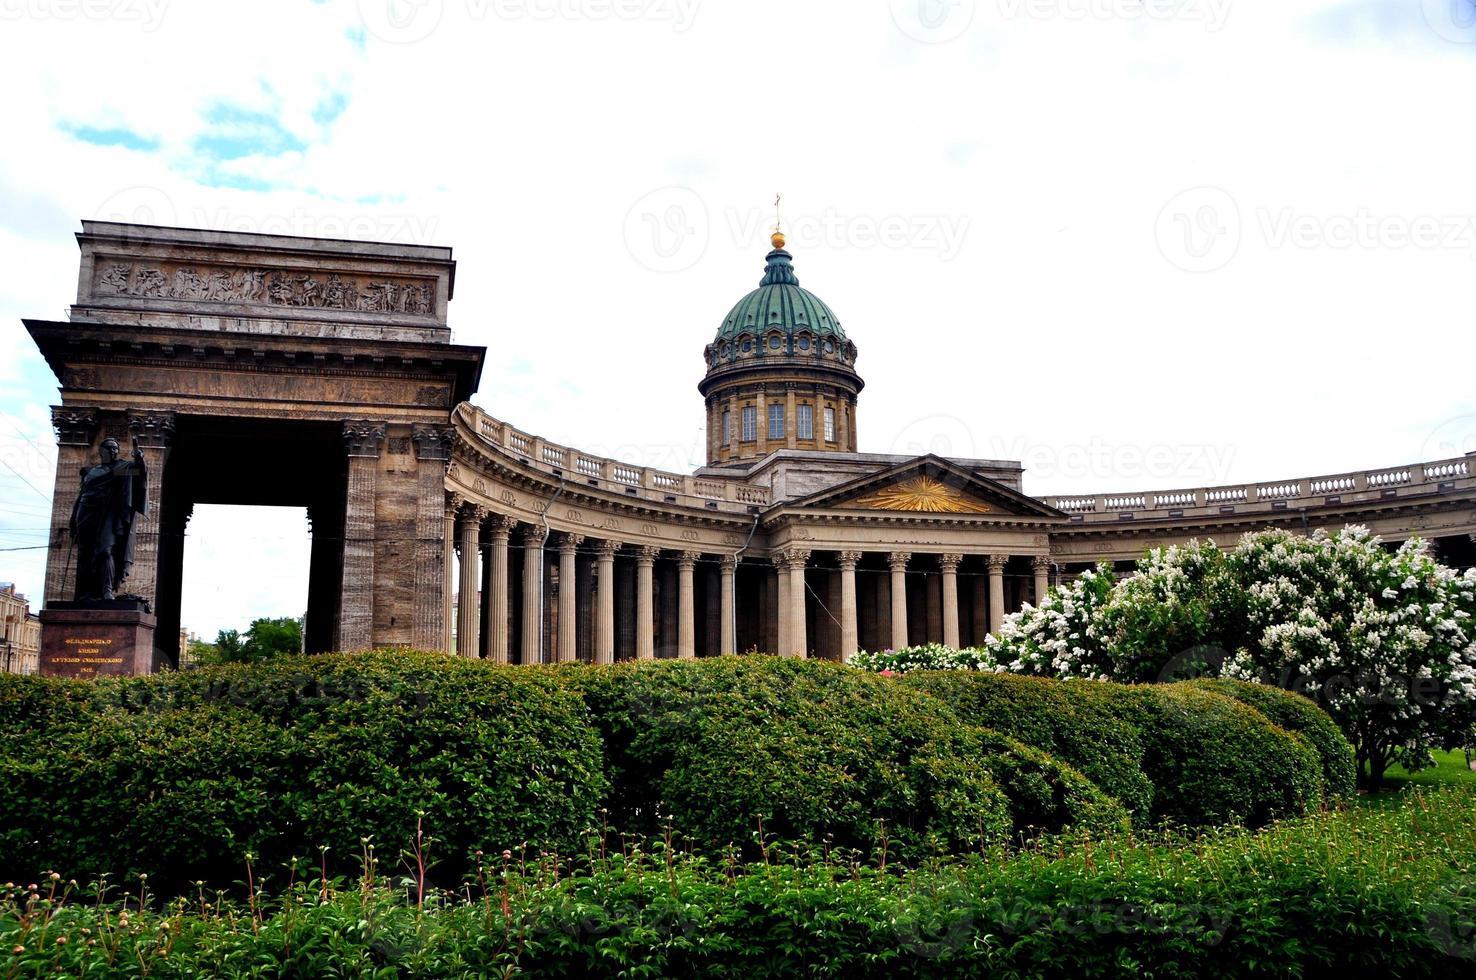 catedral de kazan, st. petersburg foto